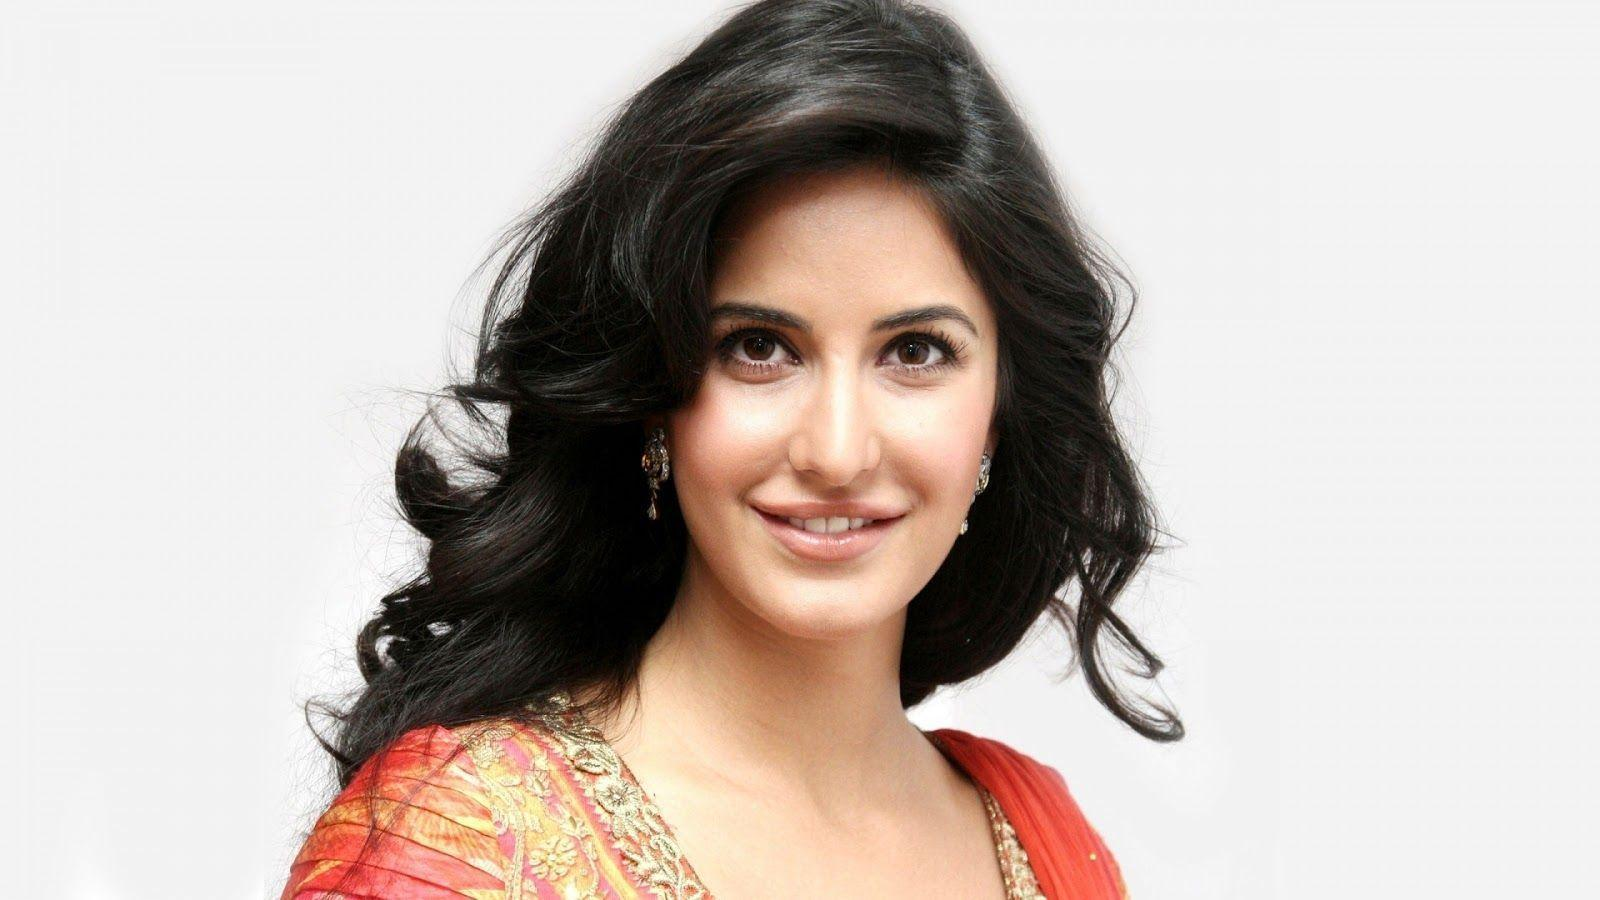 Full HD Wallpapers Bollywood Actress 1600x900